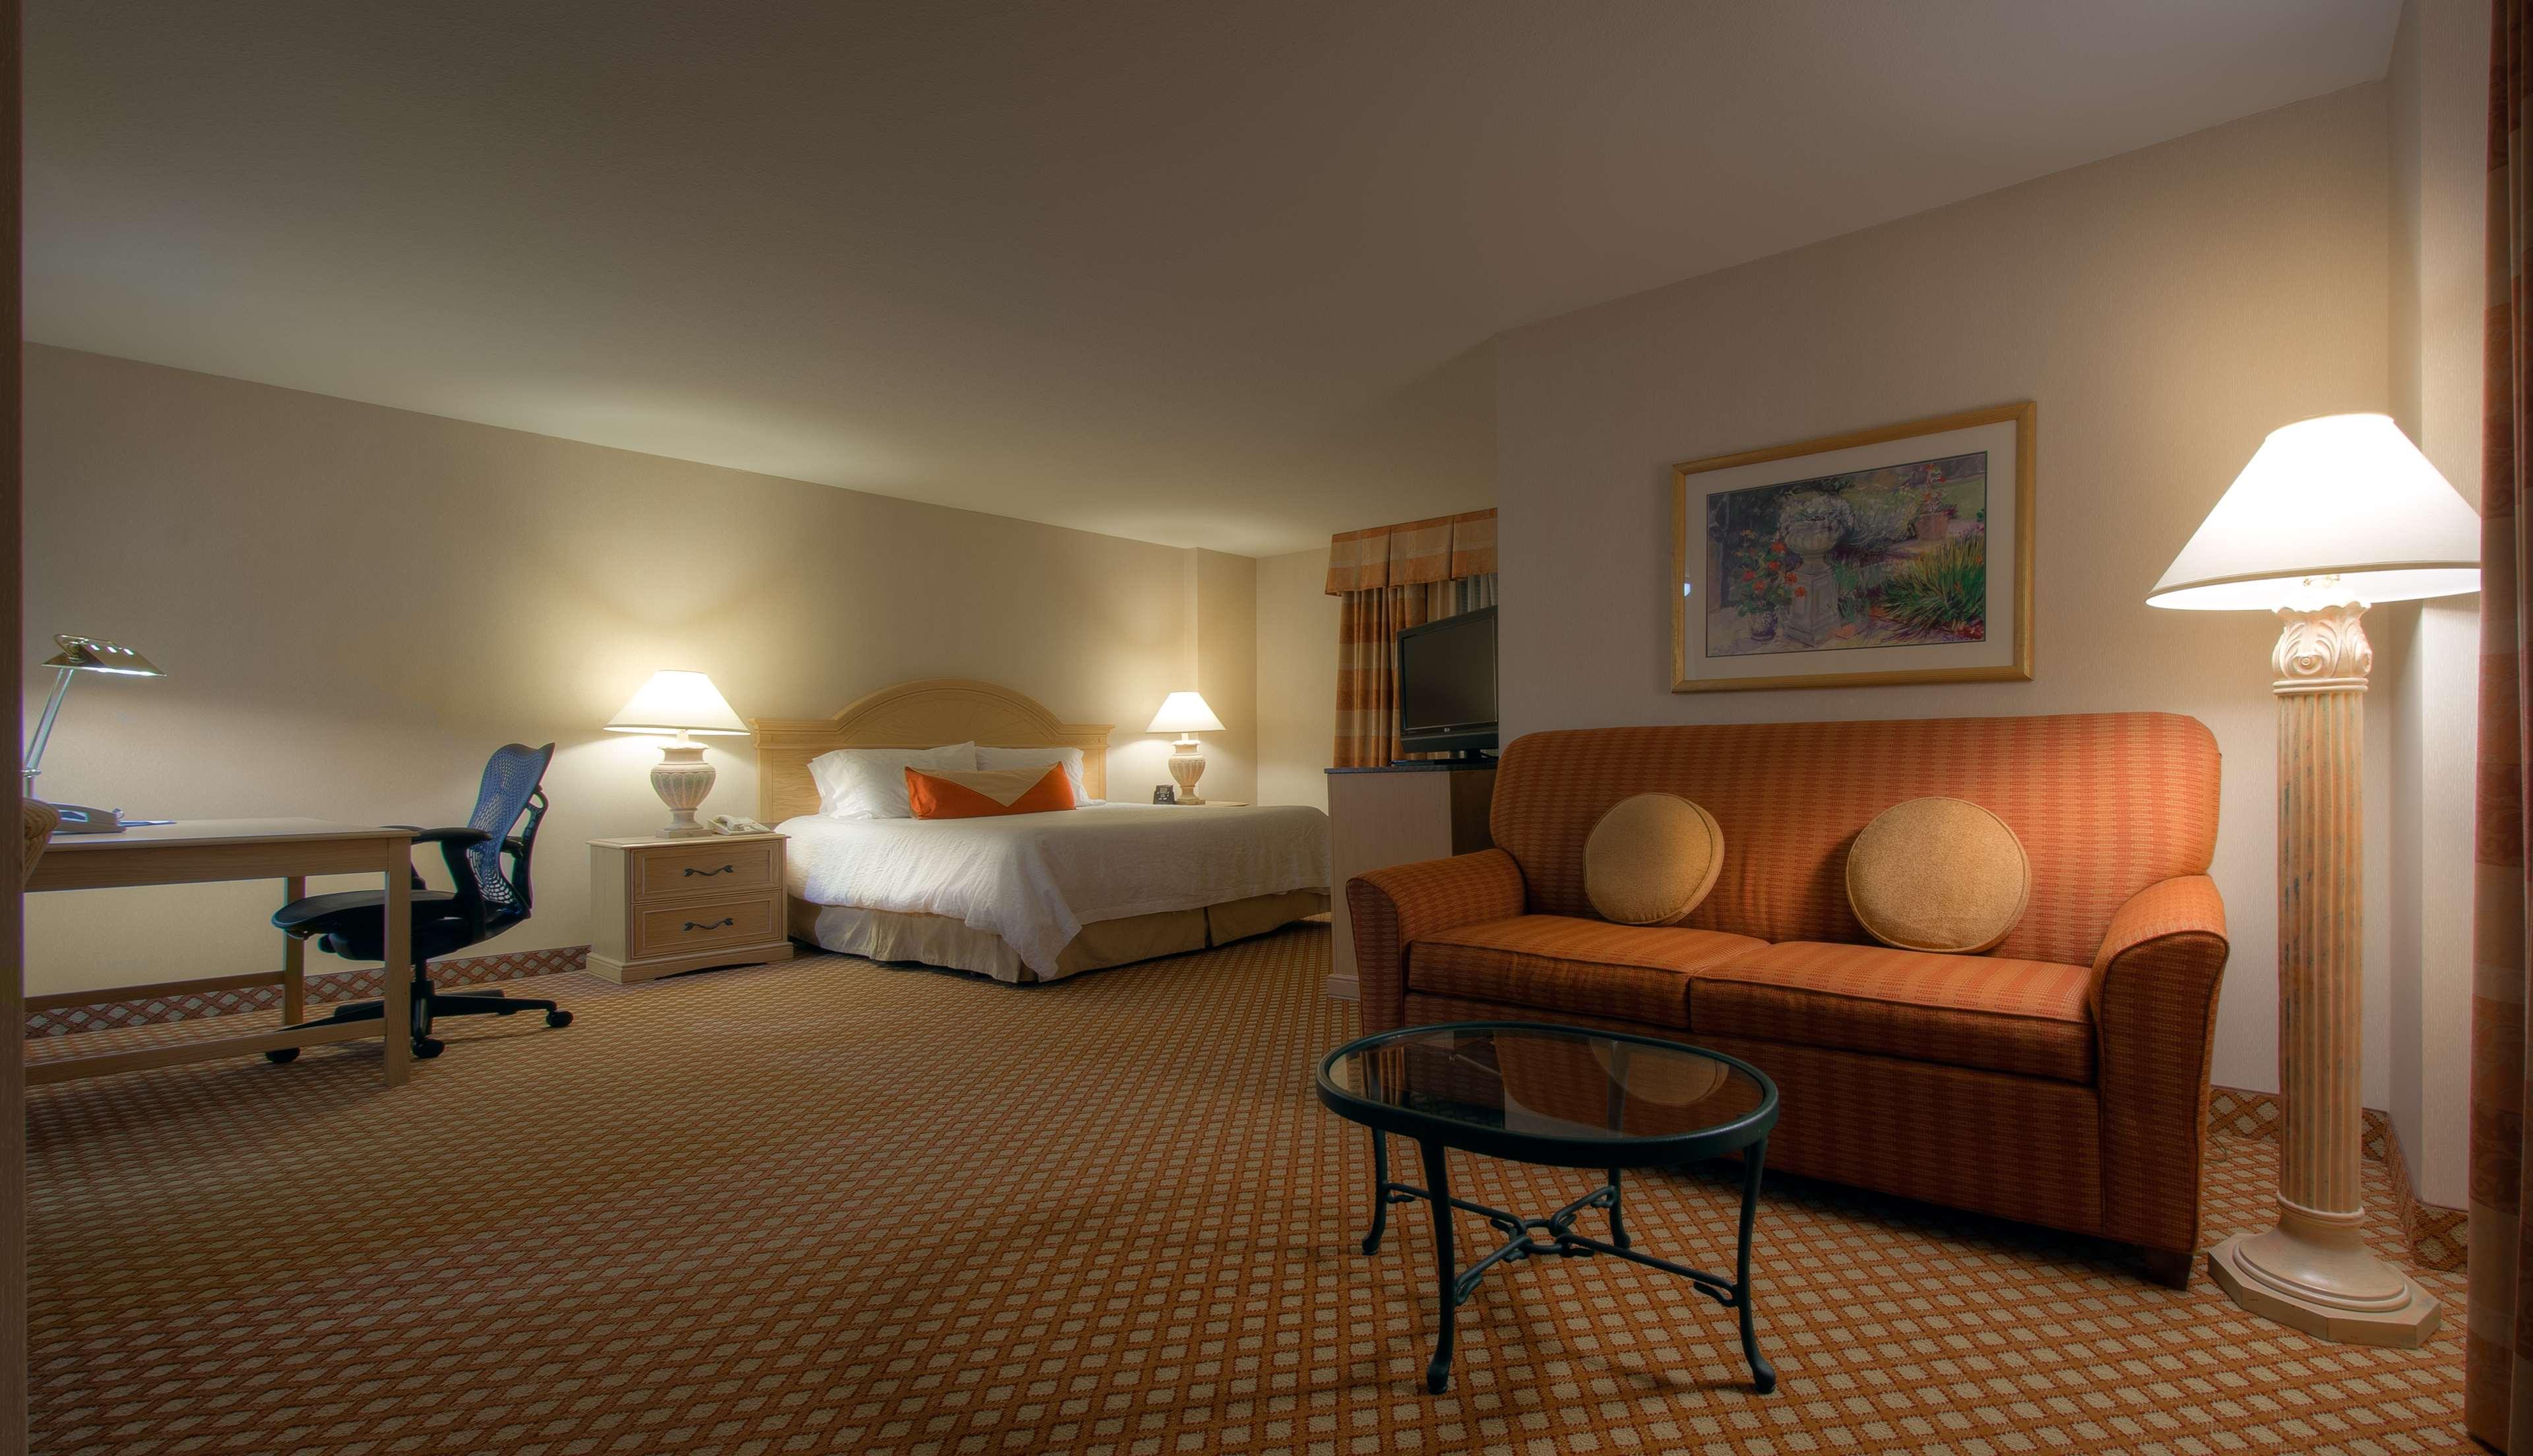 Hilton Garden Inn Mountain View image 9